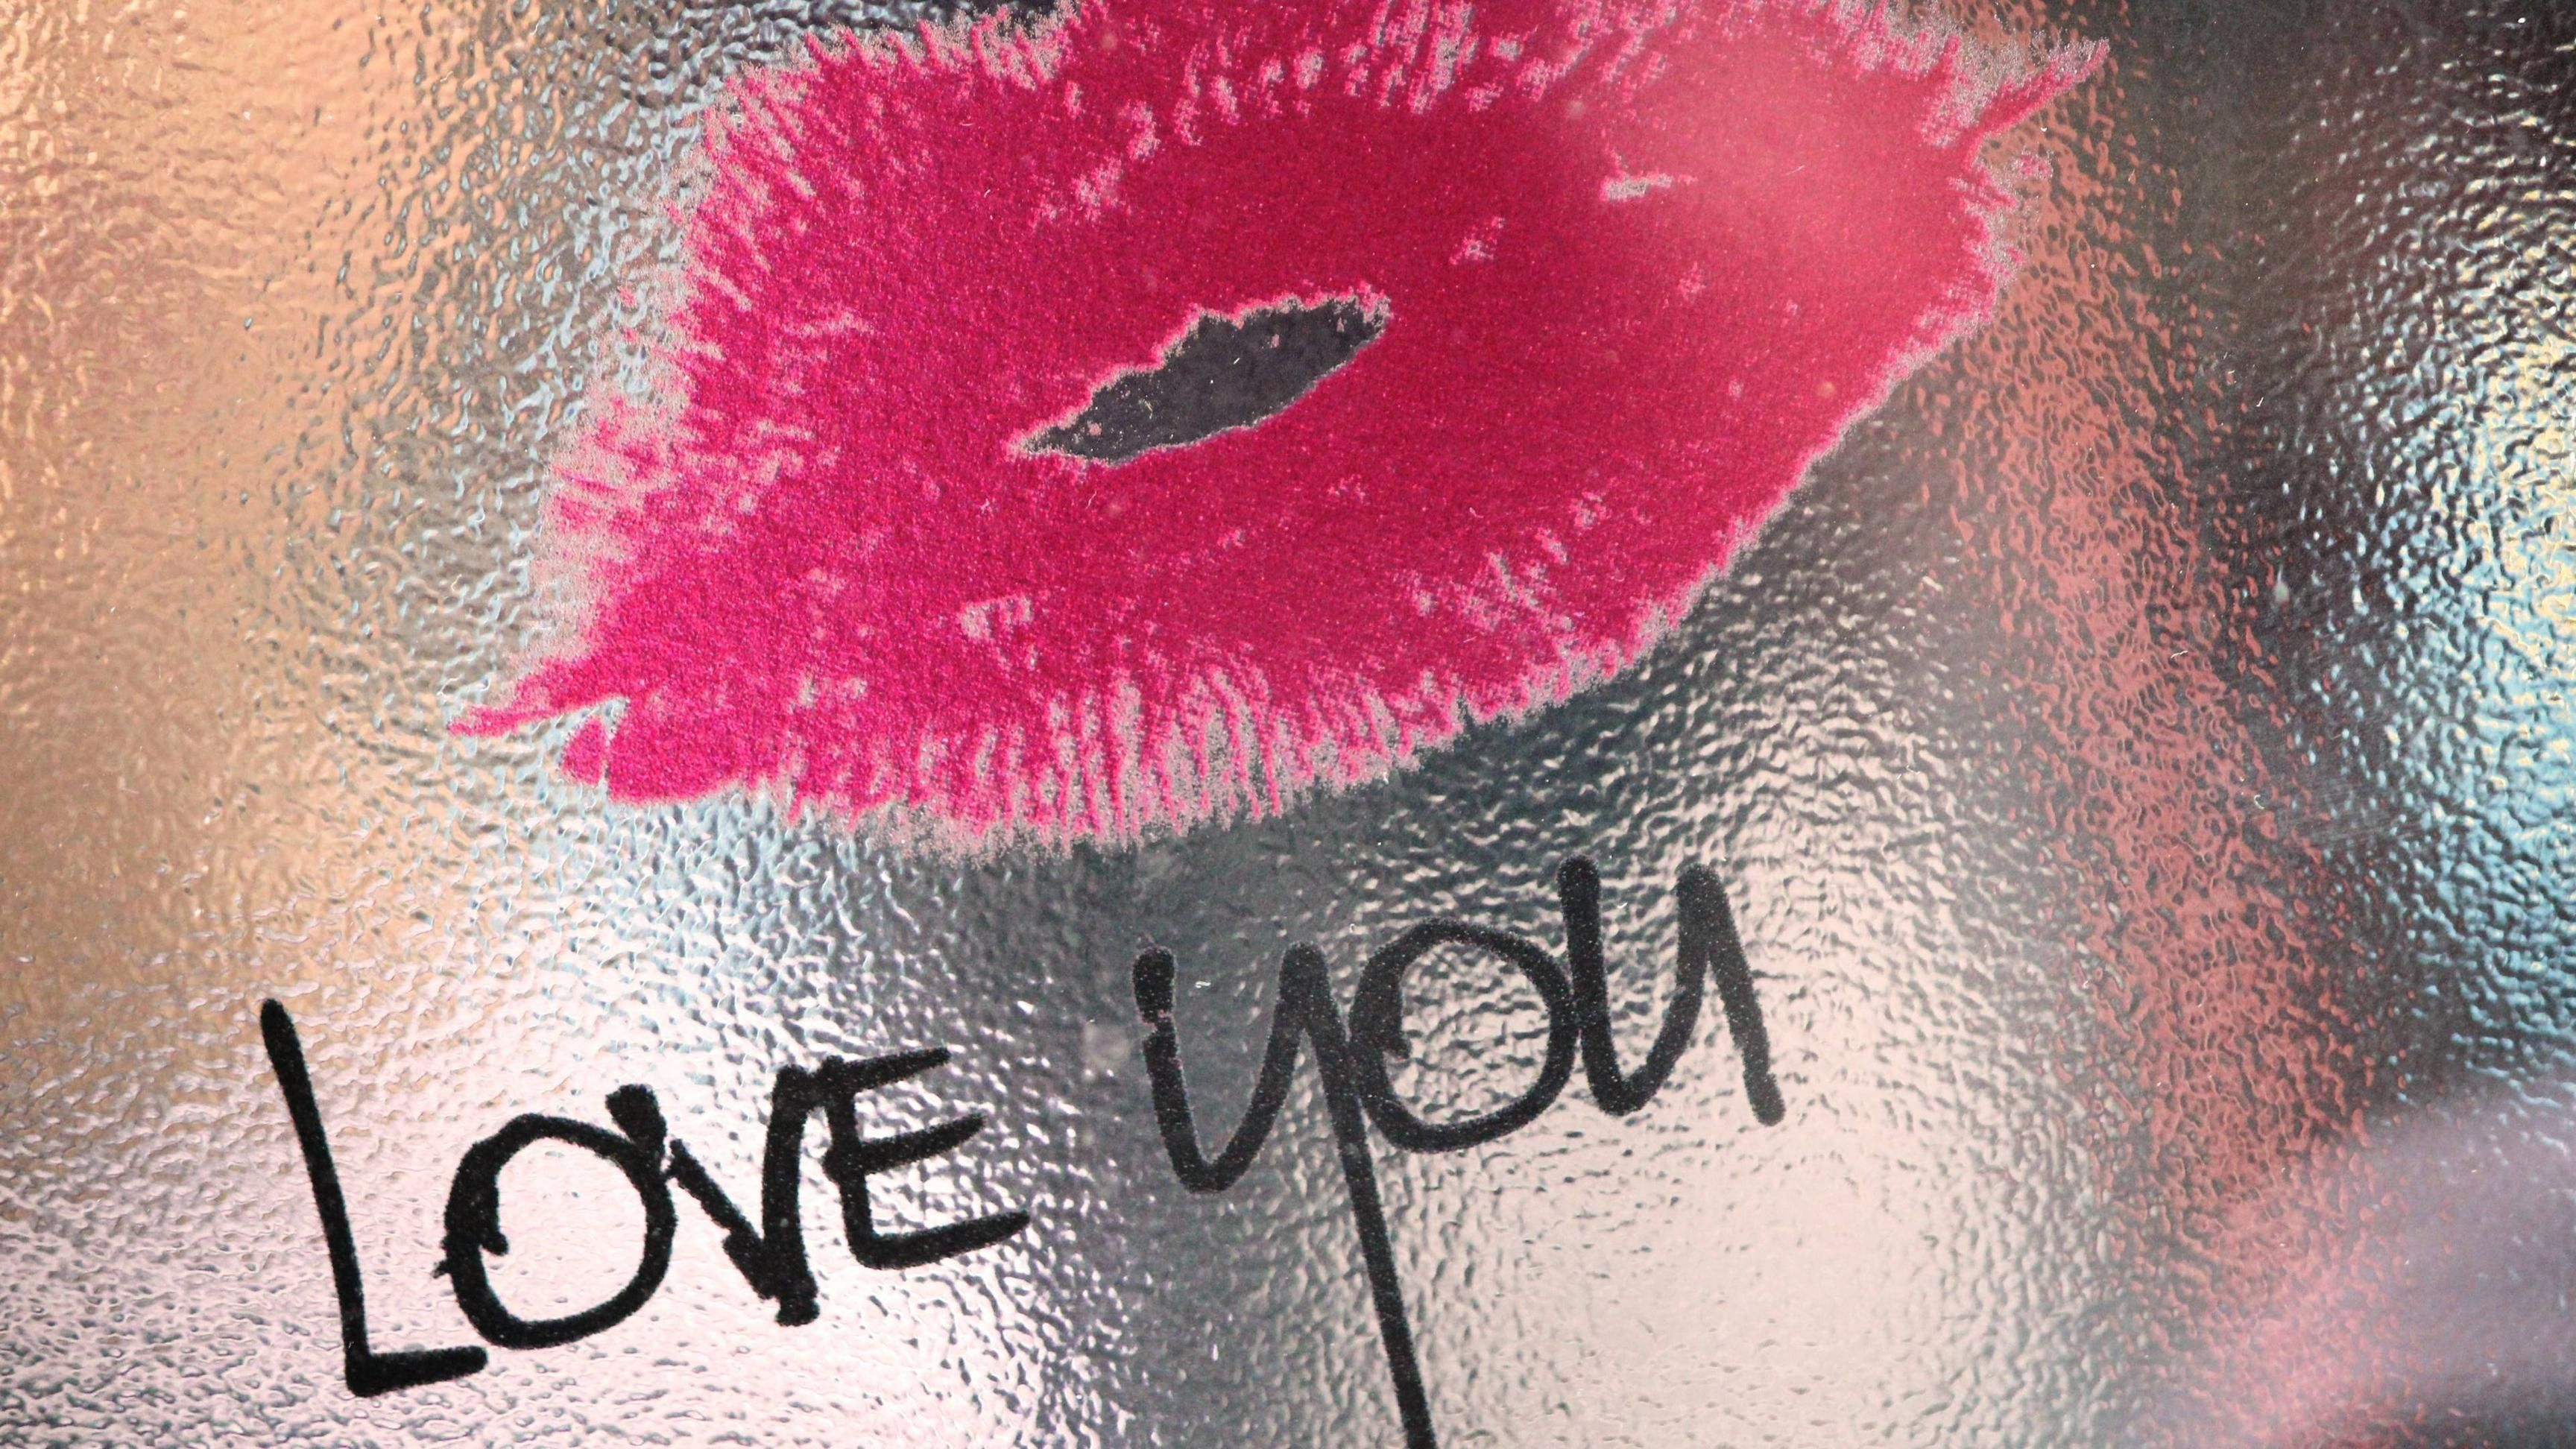 Love Kiss Background Hd Love Wallpaper Valentines Wallpaper Valentine Day Kiss